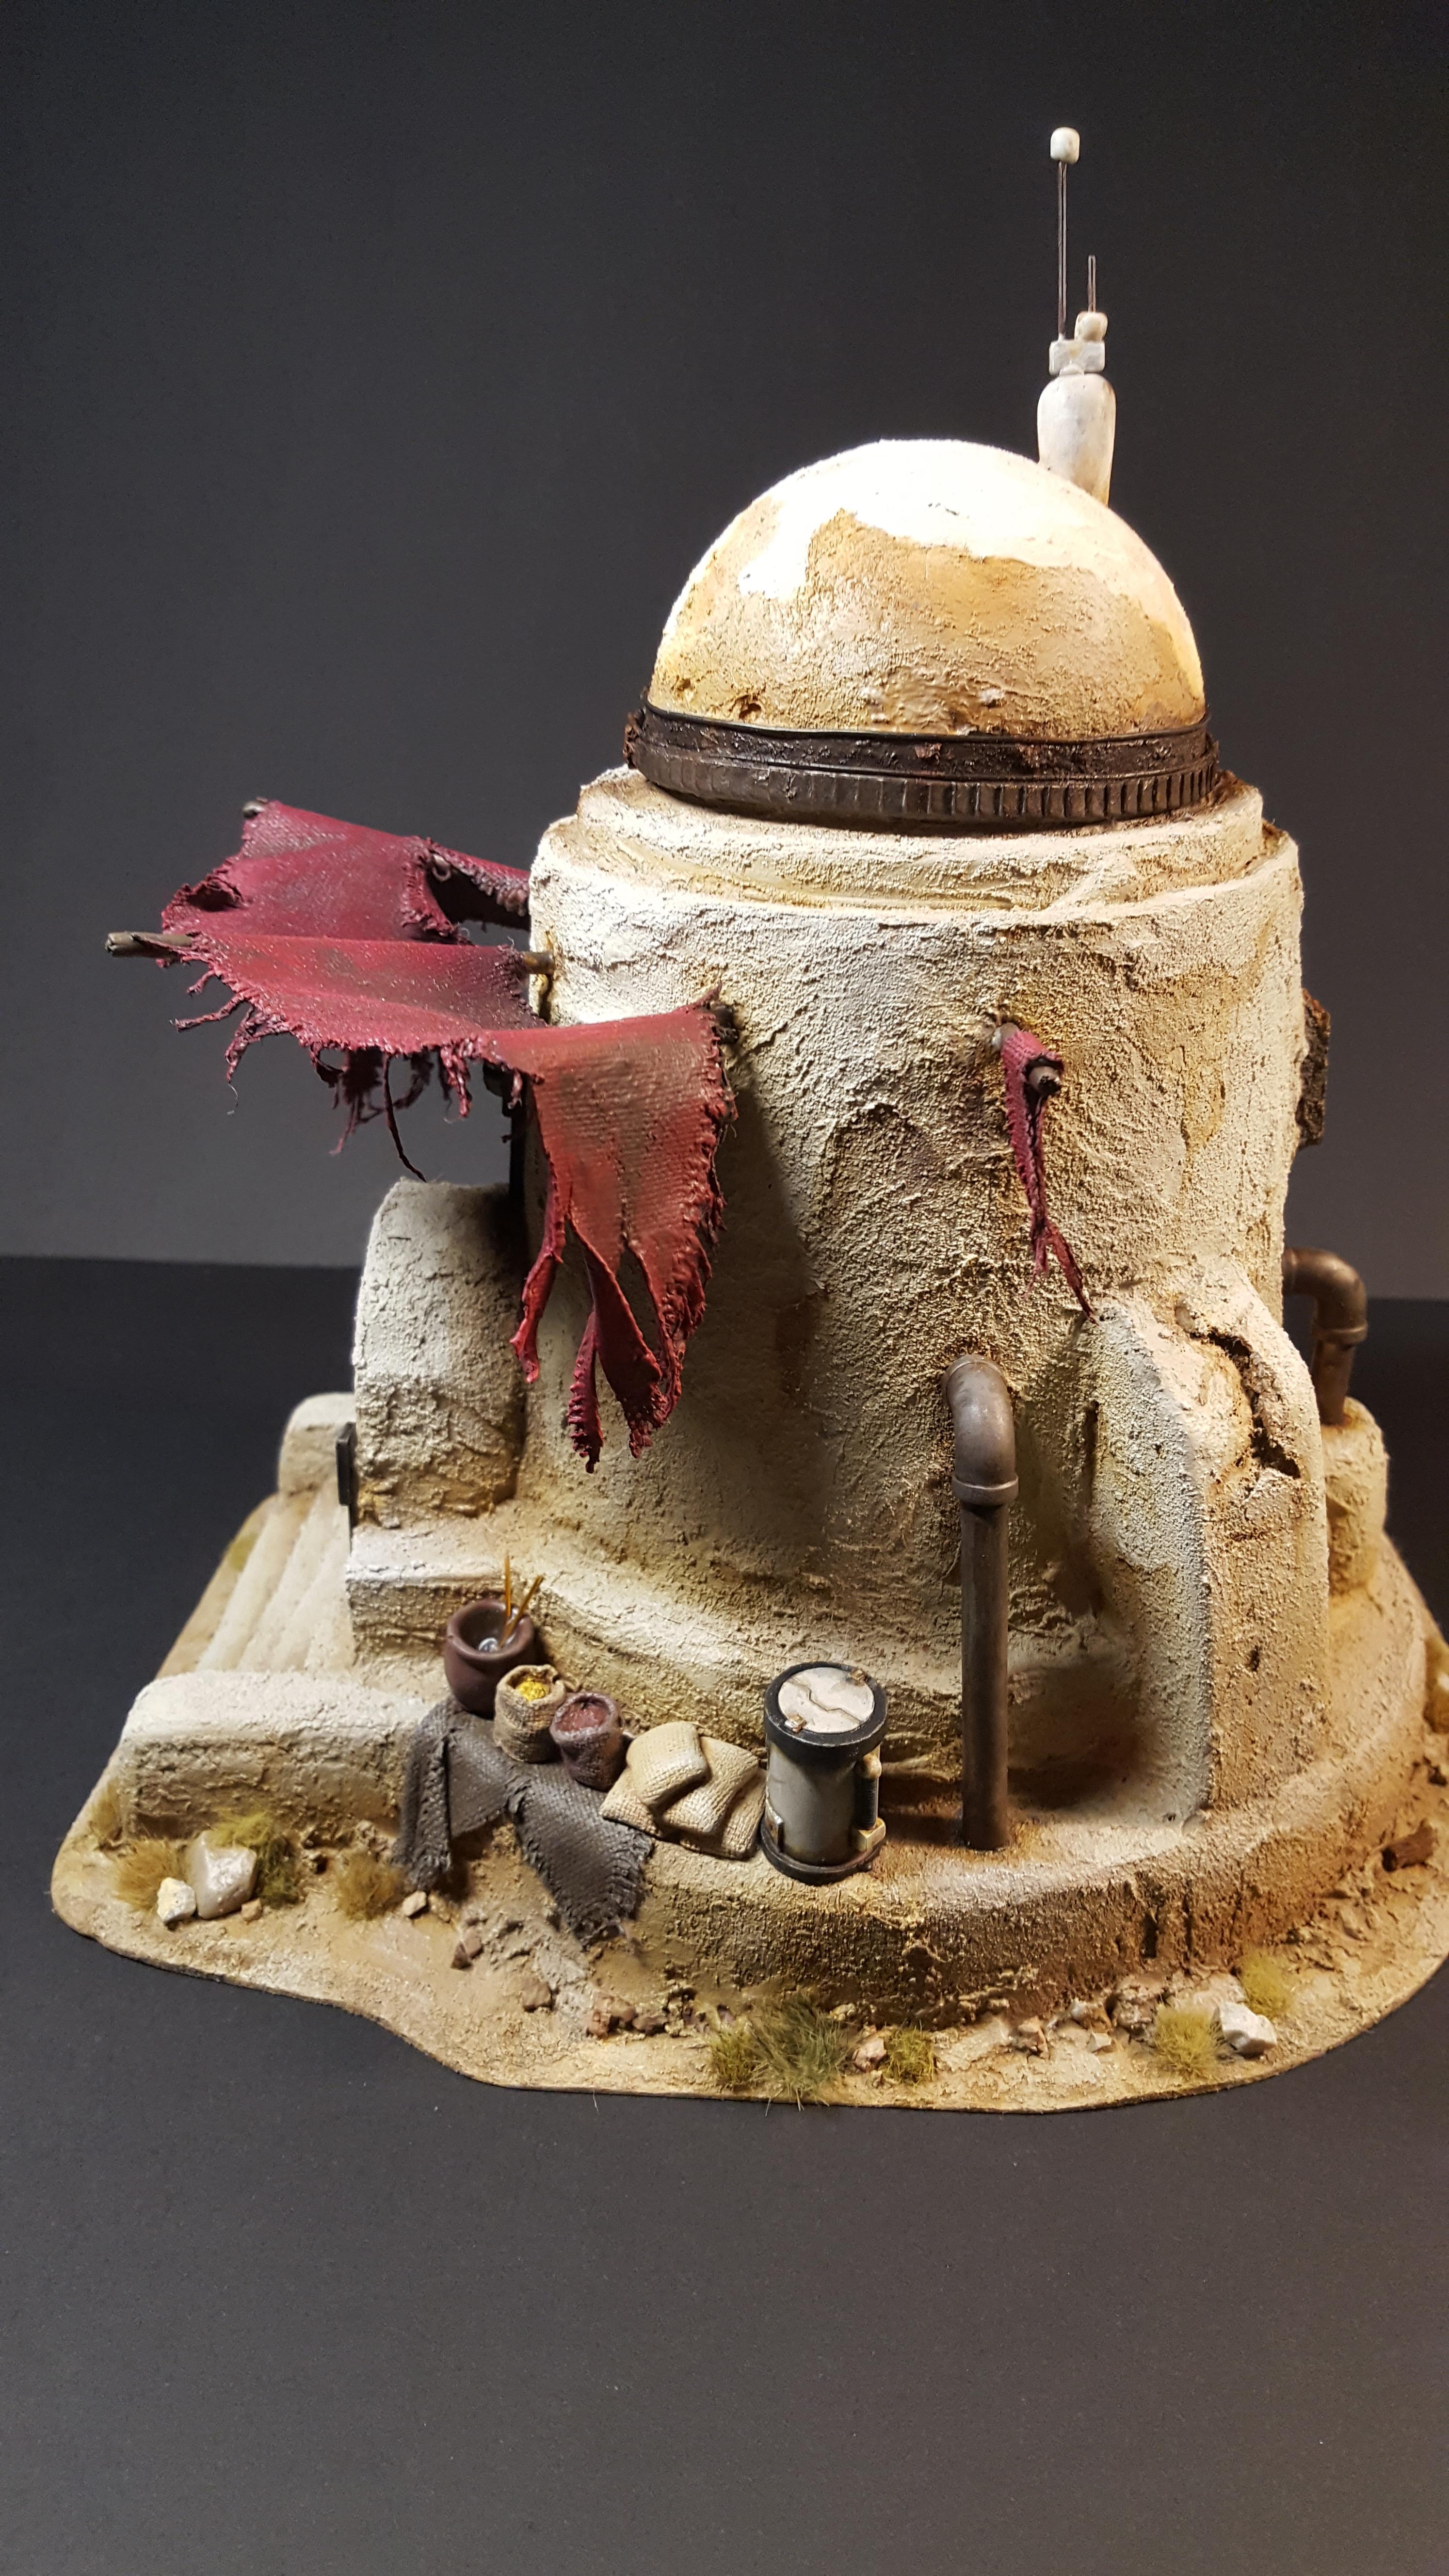 Desert, Sci Fi, Star Wars, Swlegion, Tatooine, Terrain